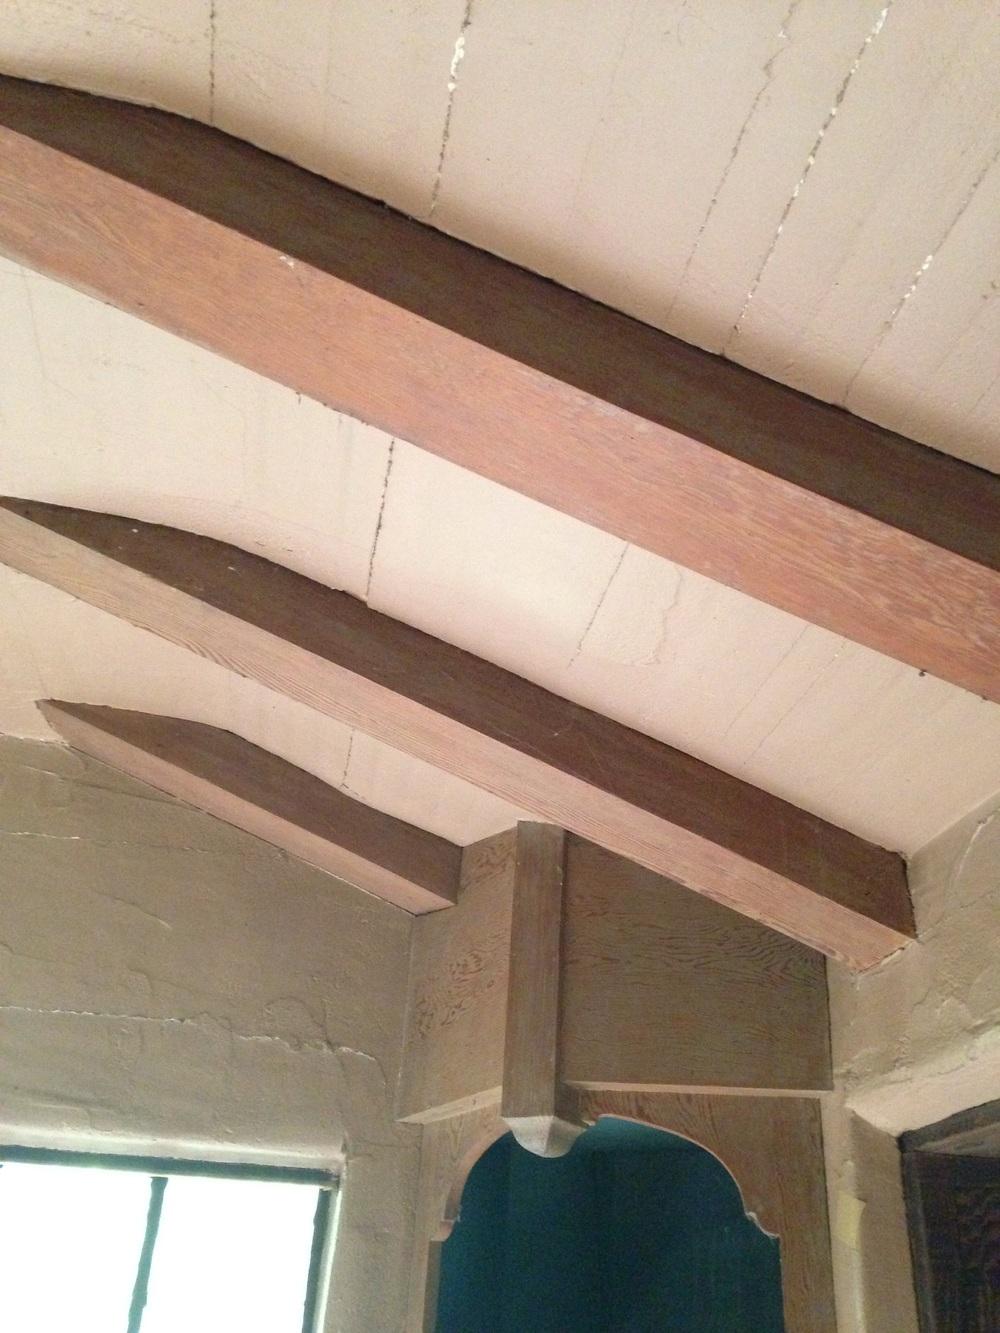 Cracked kitchen ceiling